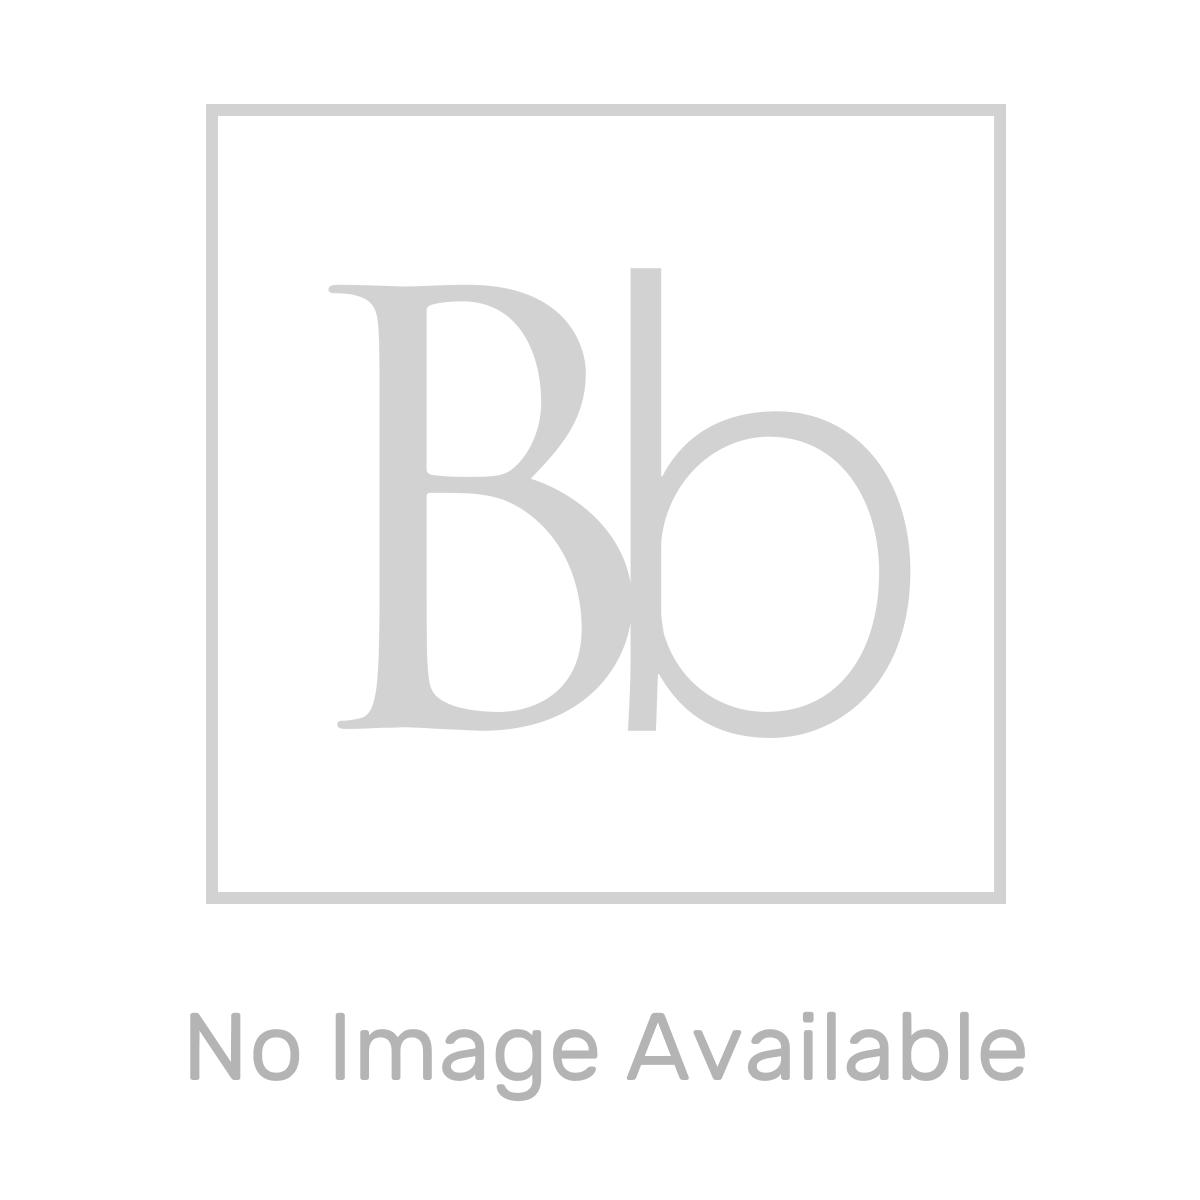 Frontline Harrow Chrome Heated Towel Rail With Ladder-Style Towel Bar W600 H1200